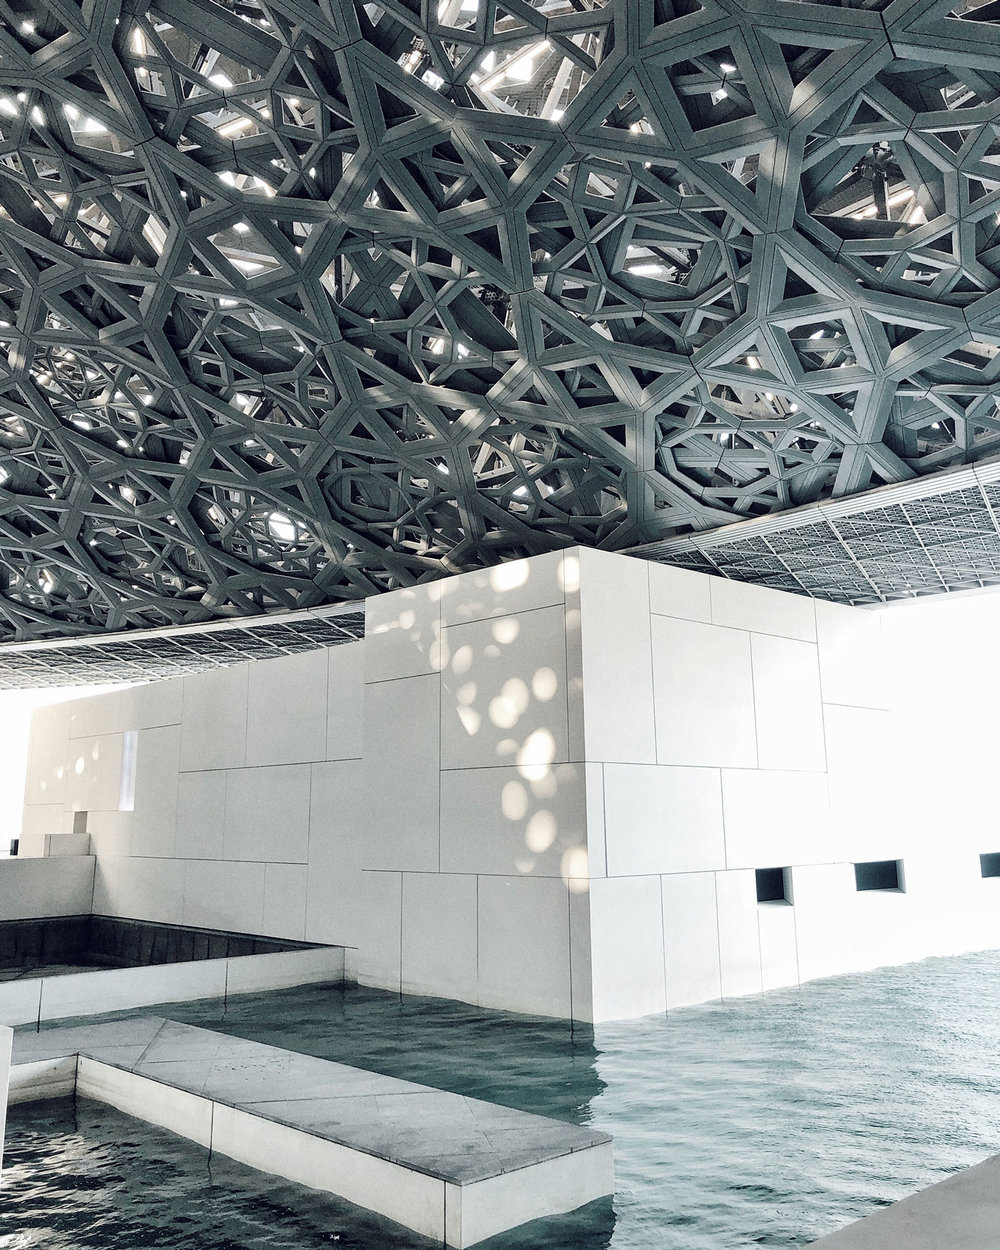 Lourve Abu Dhabi Star Ceiling Travel Photography / Dubai Travel Tips